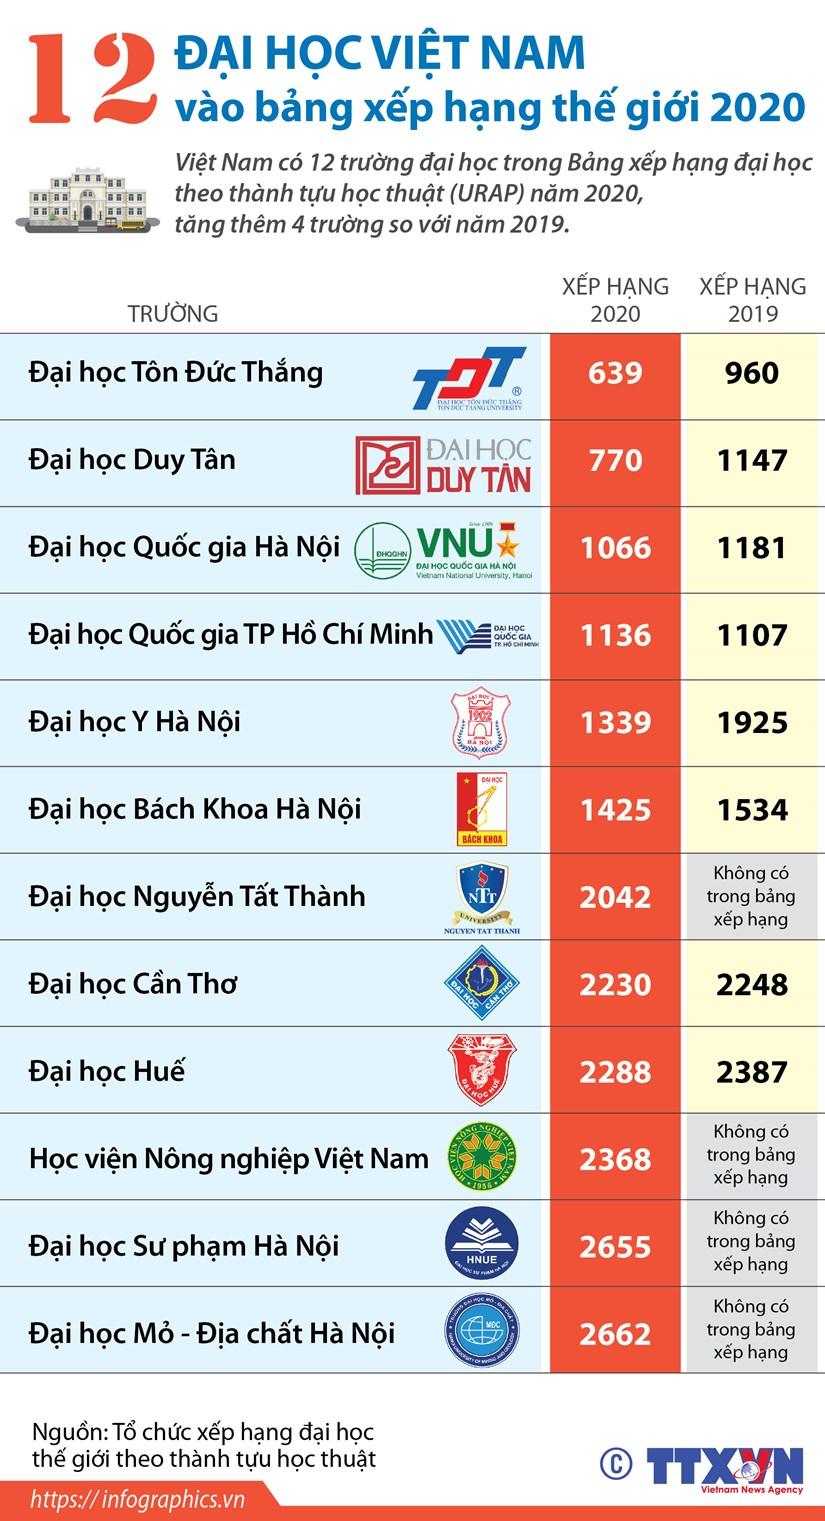 [Infographics] 12 dai hoc Viet Nam vao bang xep hang the gioi 2020 hinh anh 1